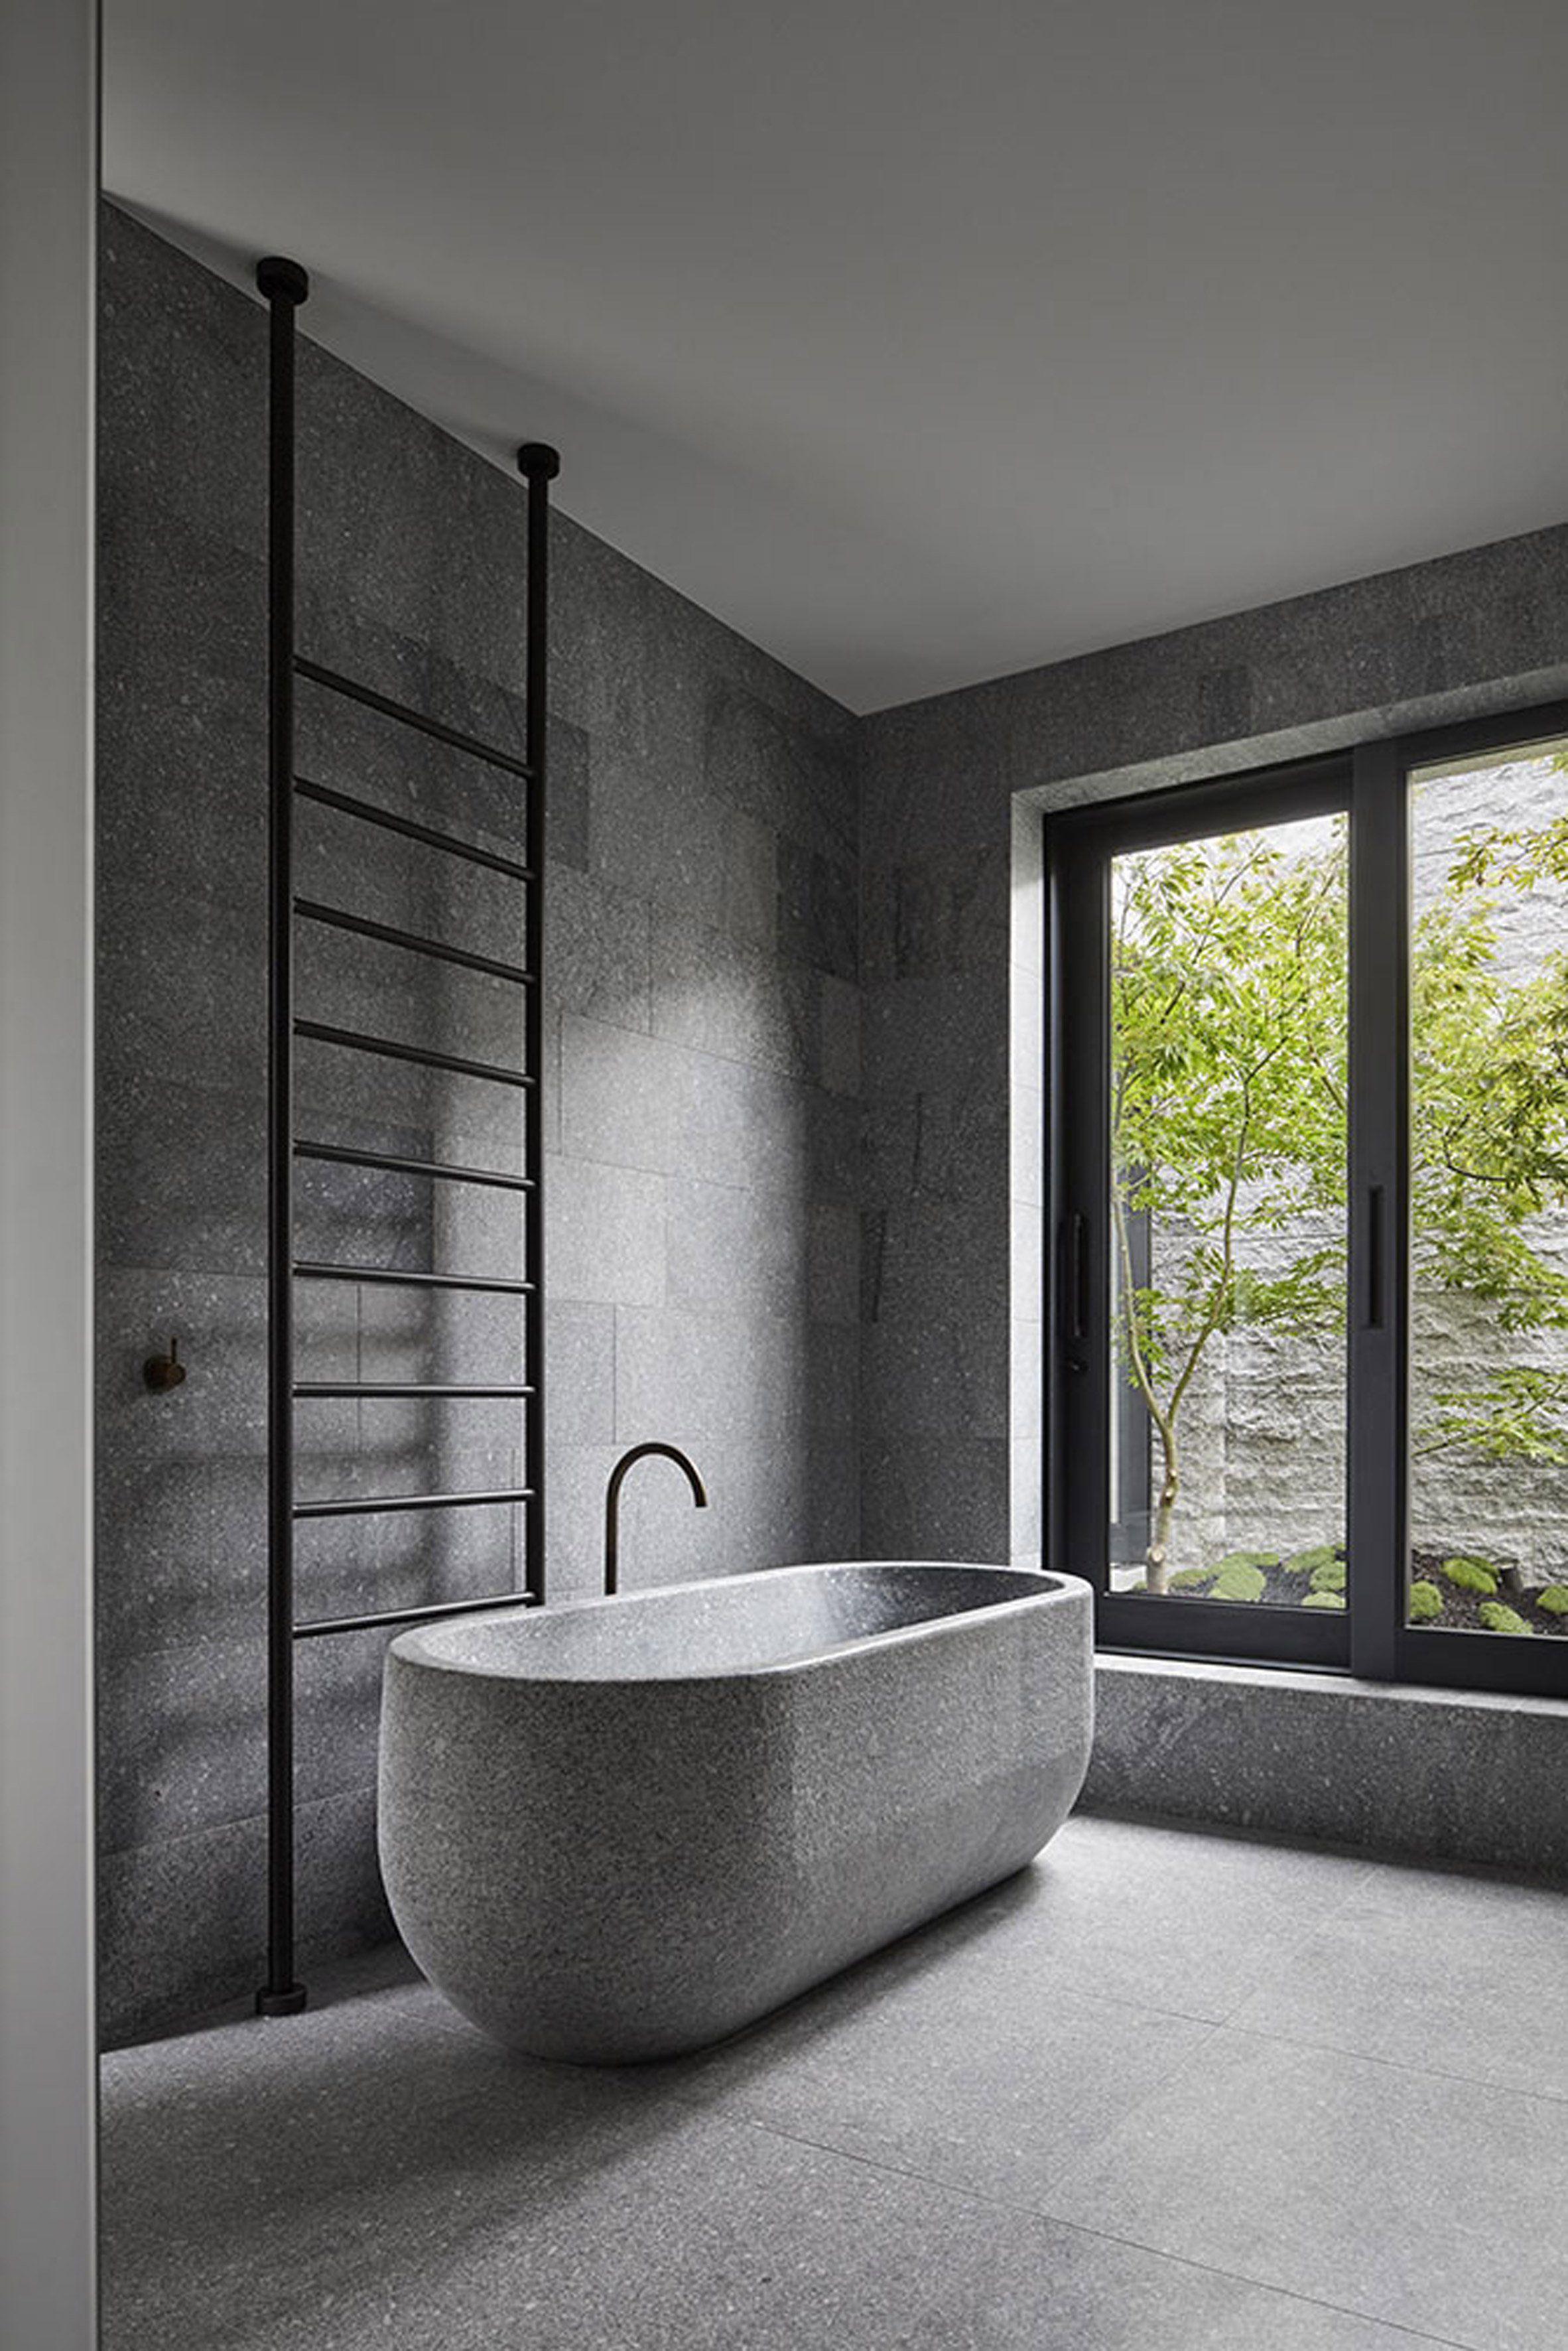 Badezimmerdesign mit jacuzzi pin by jeffry lamin on bathroom  pinterest  architecture design